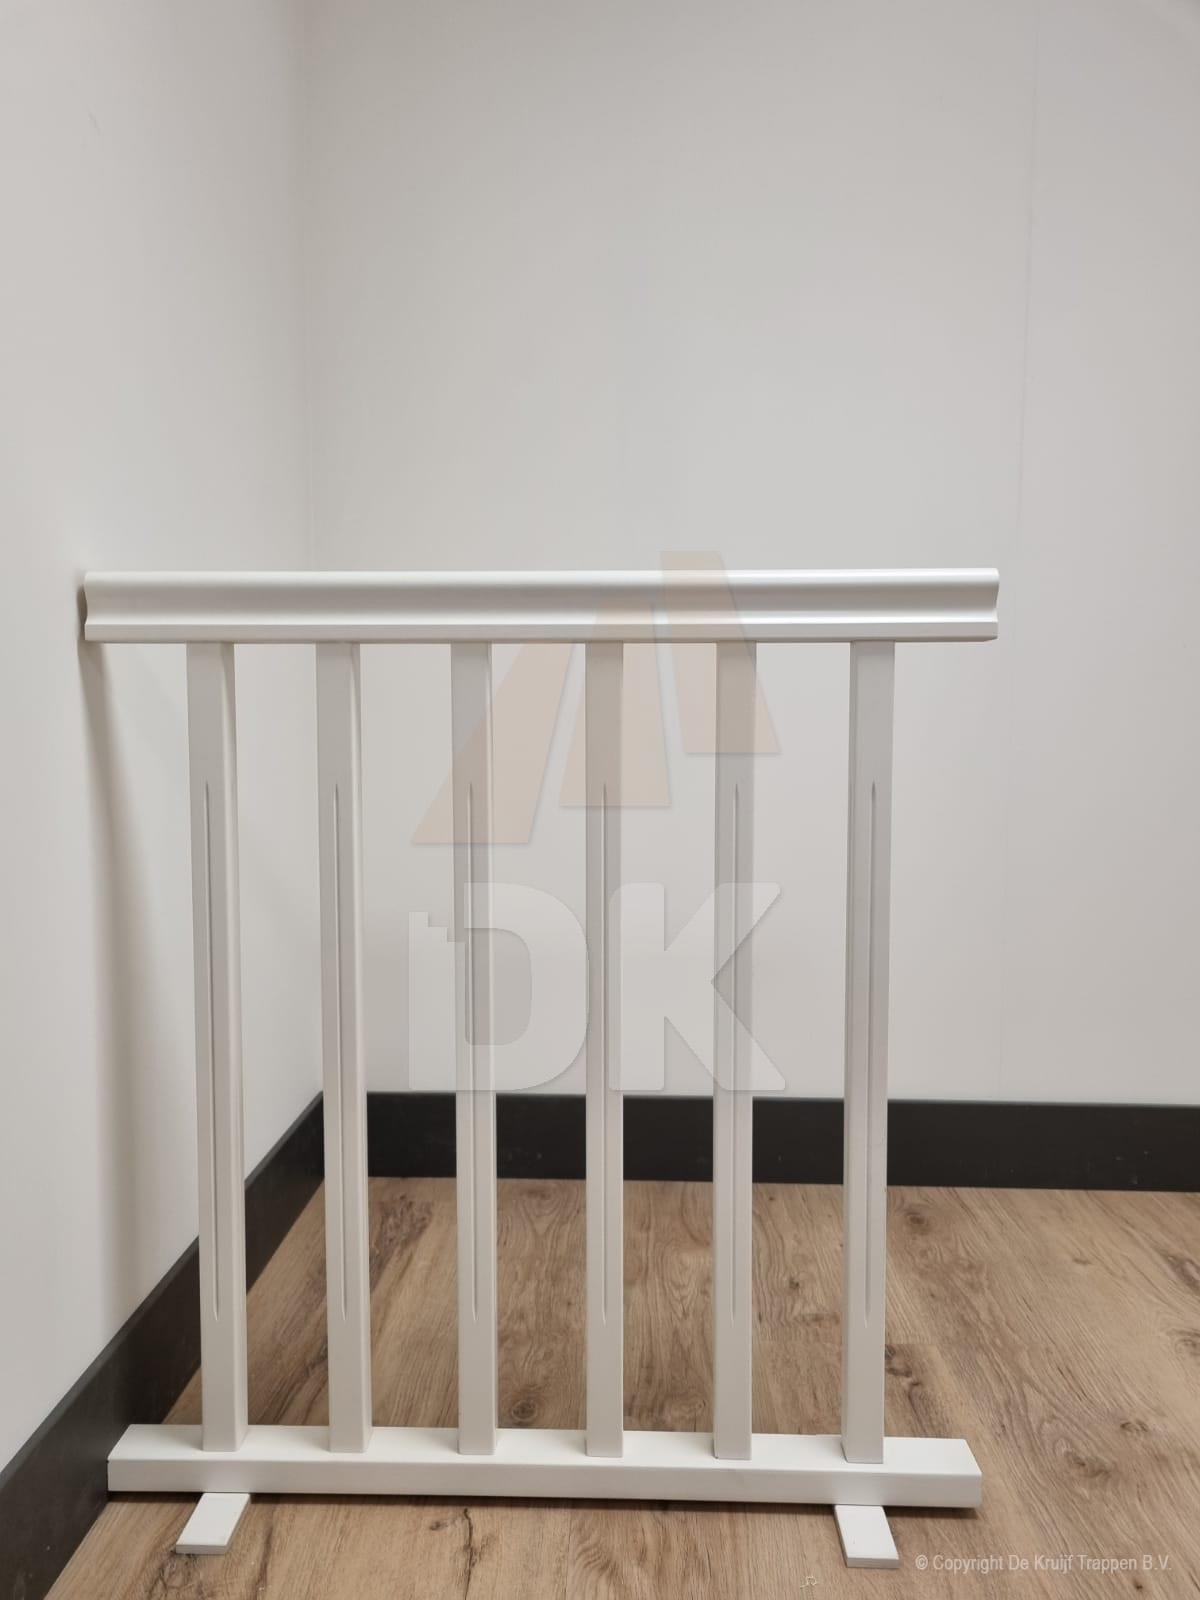 Balustrade houten spijlen - H1003